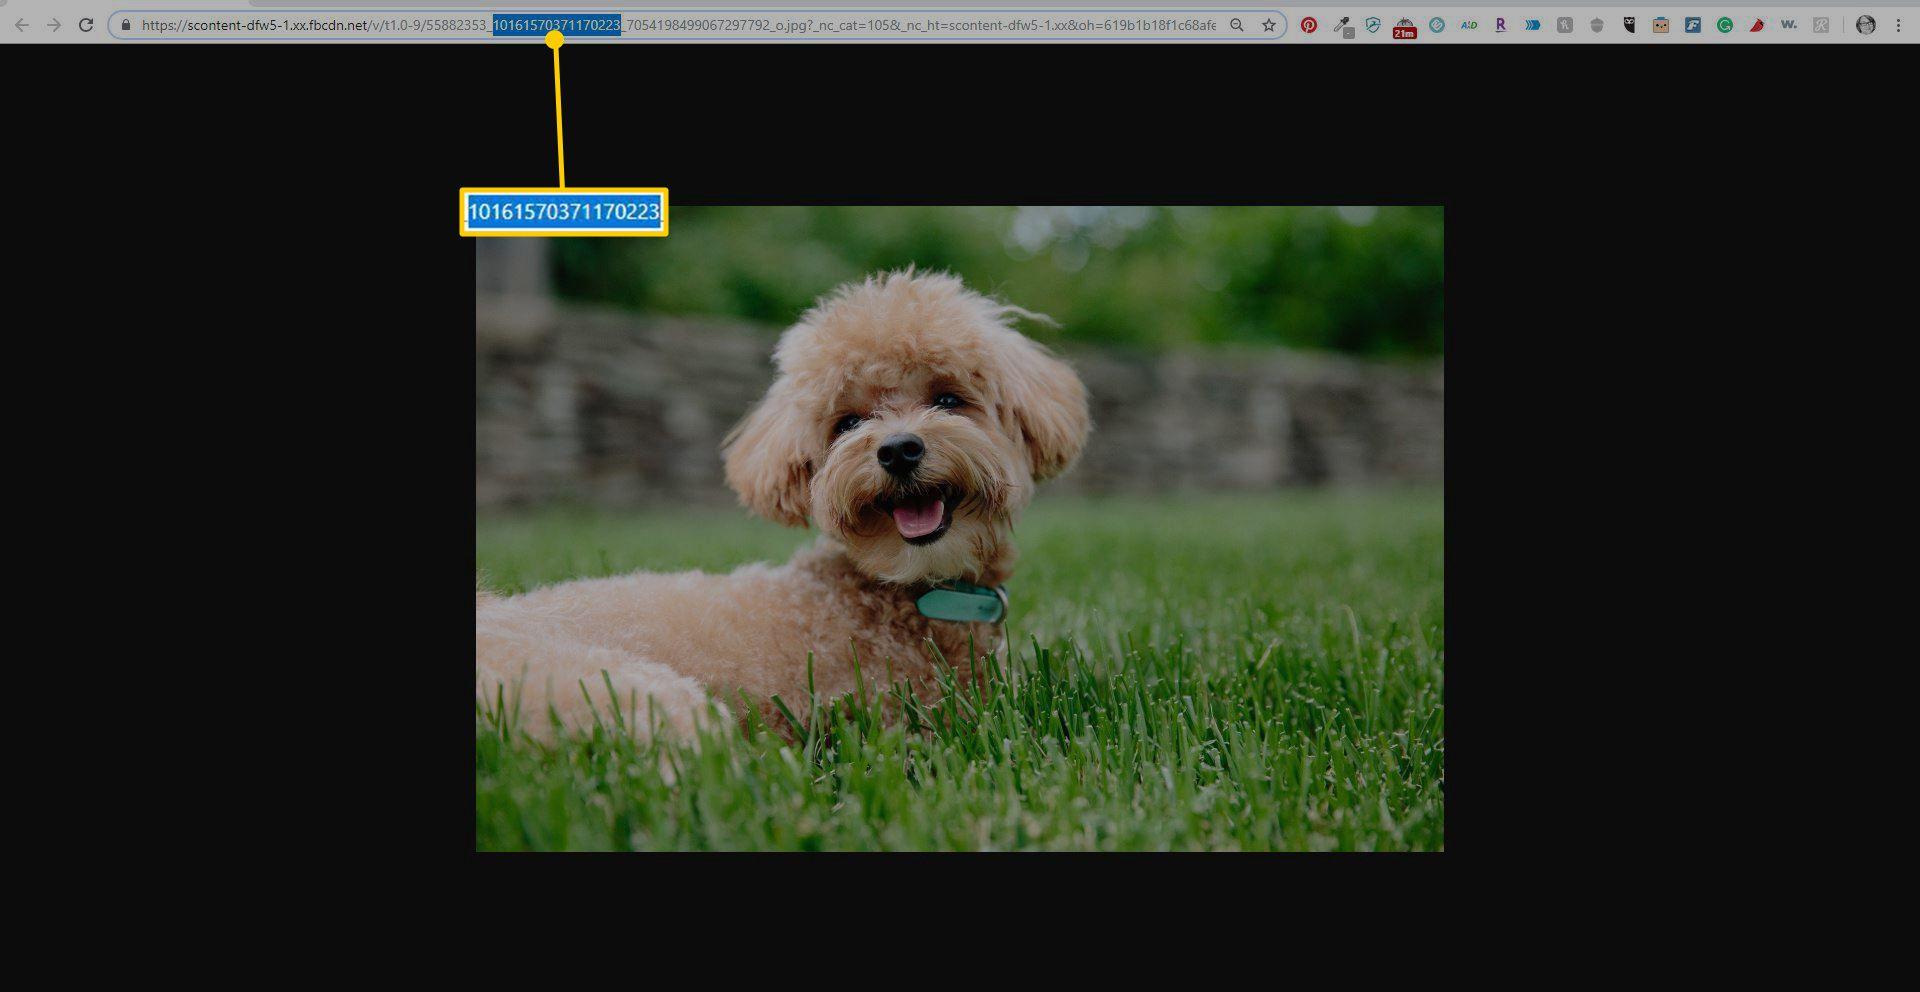 Screenshot showing image ID number